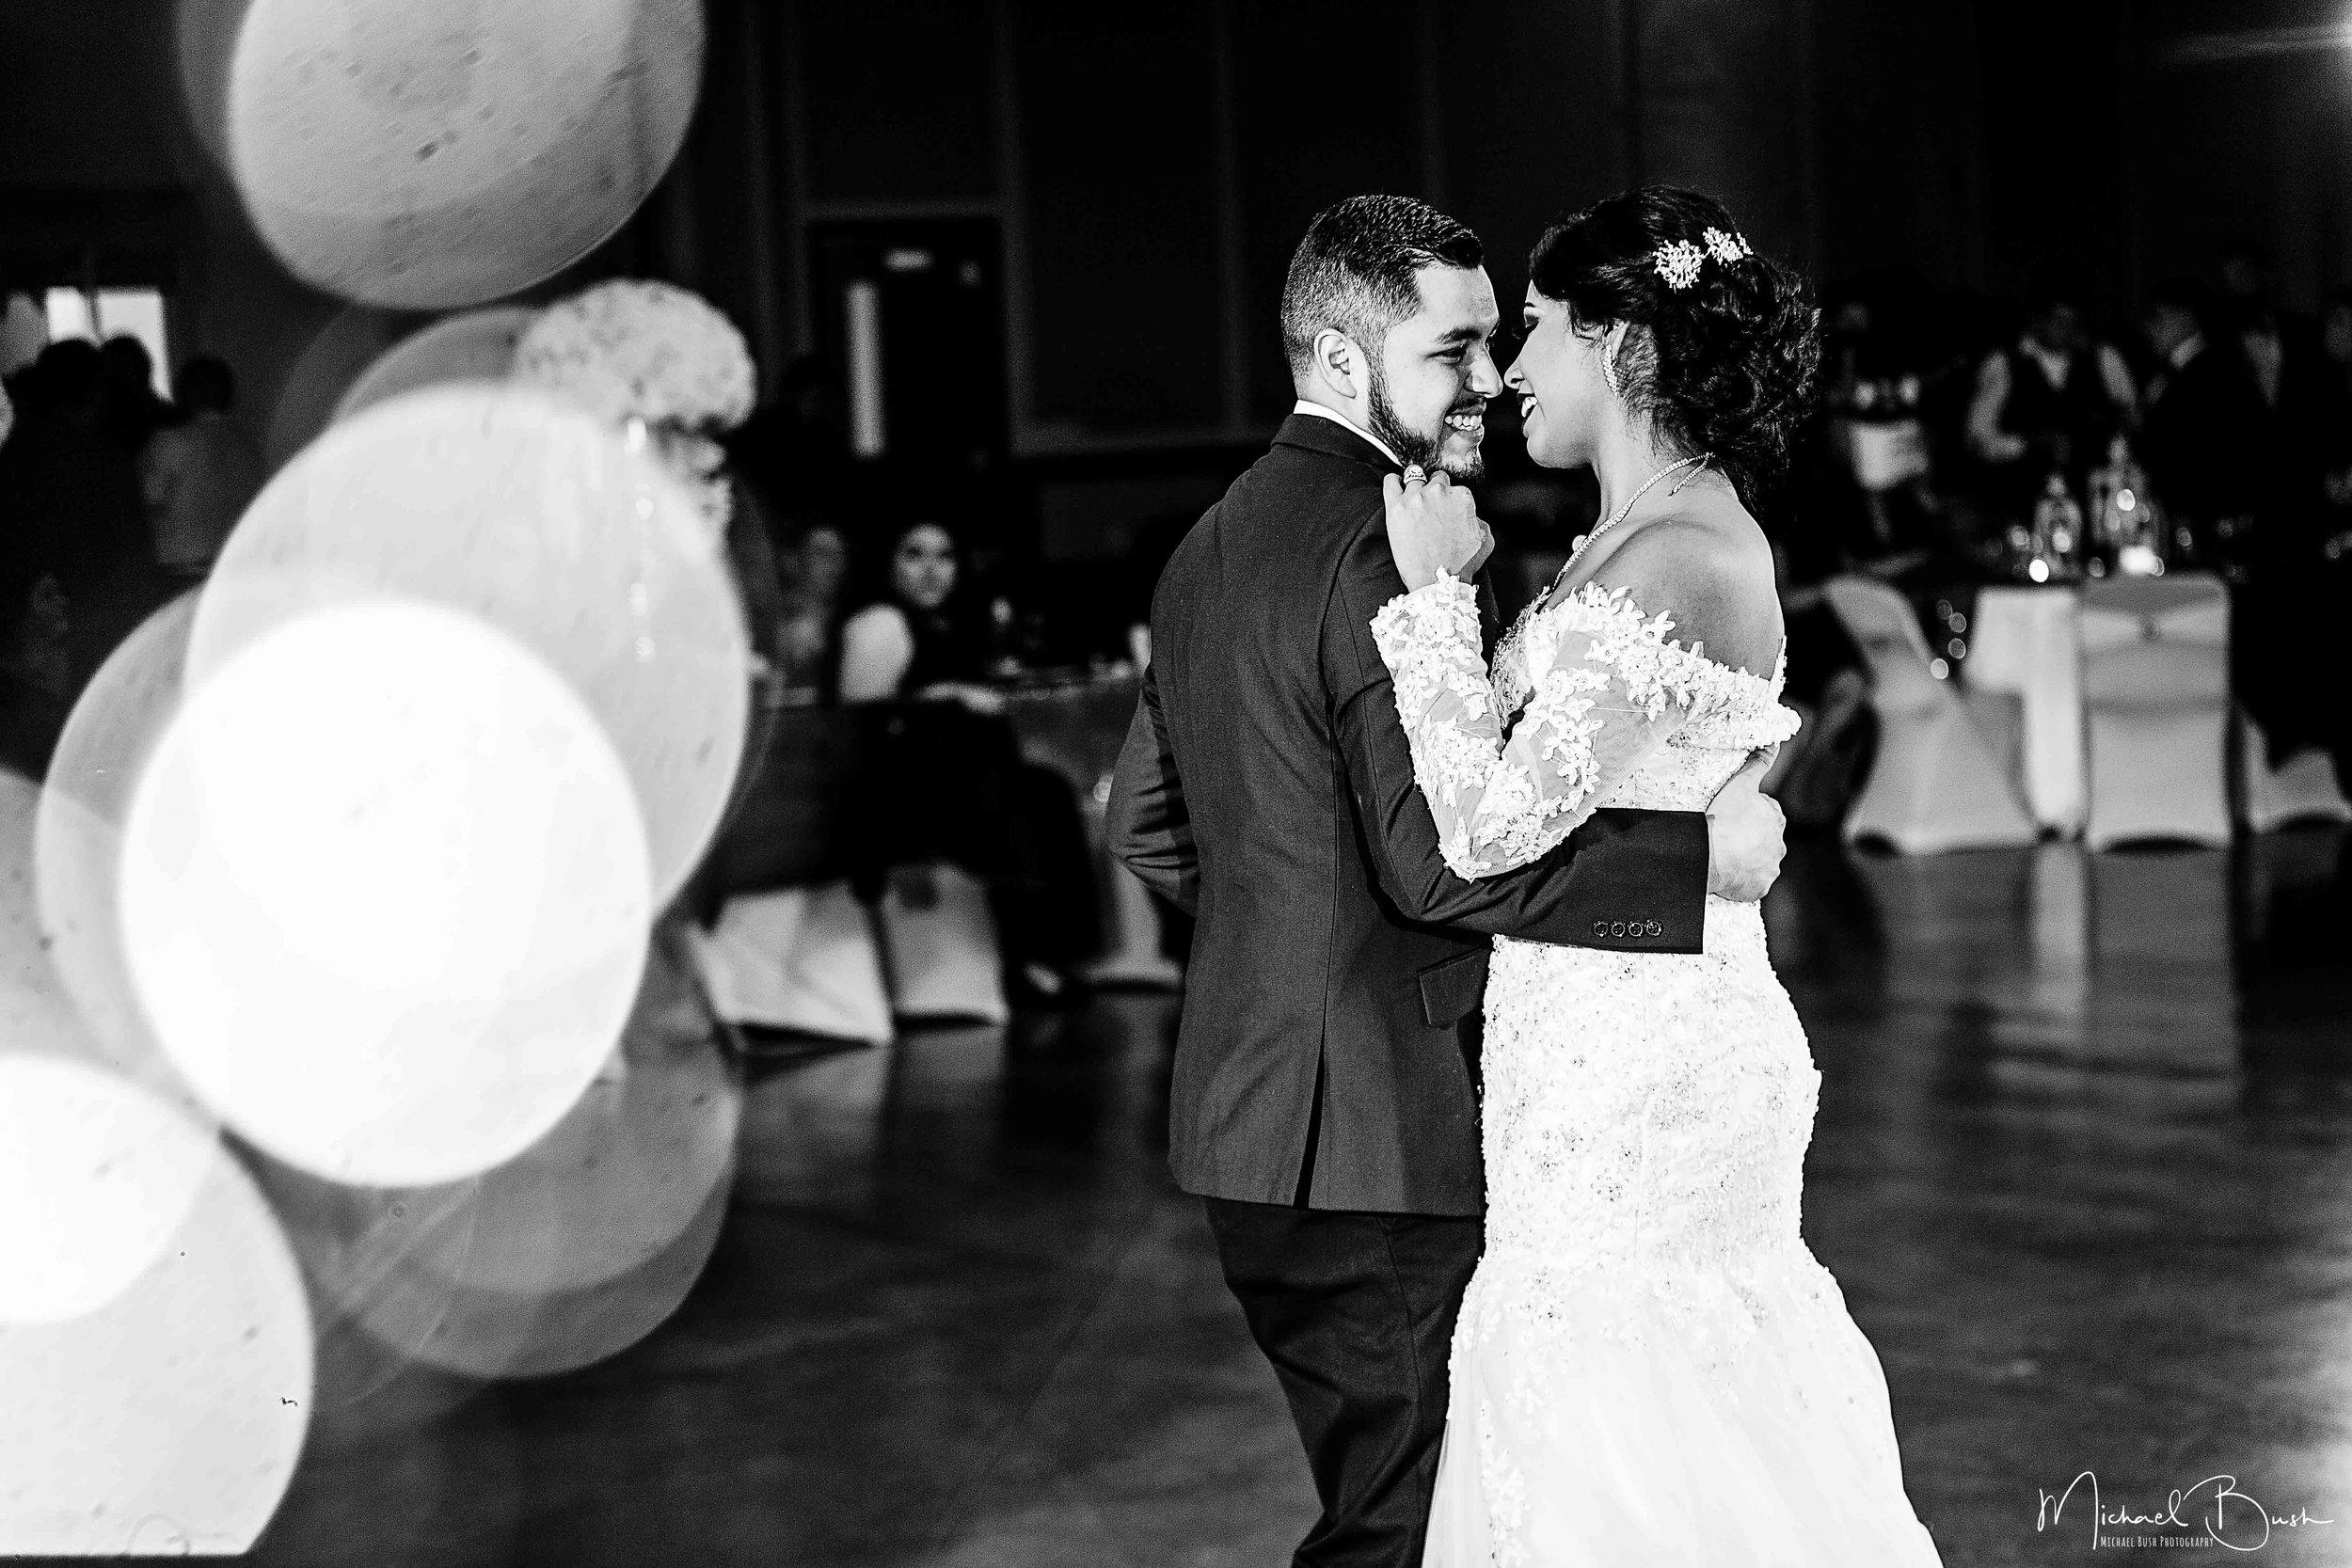 Wedding-Reception-Detials-Fort-Worth-Venue-lights-firstdance-close-receptionlighting.jpg